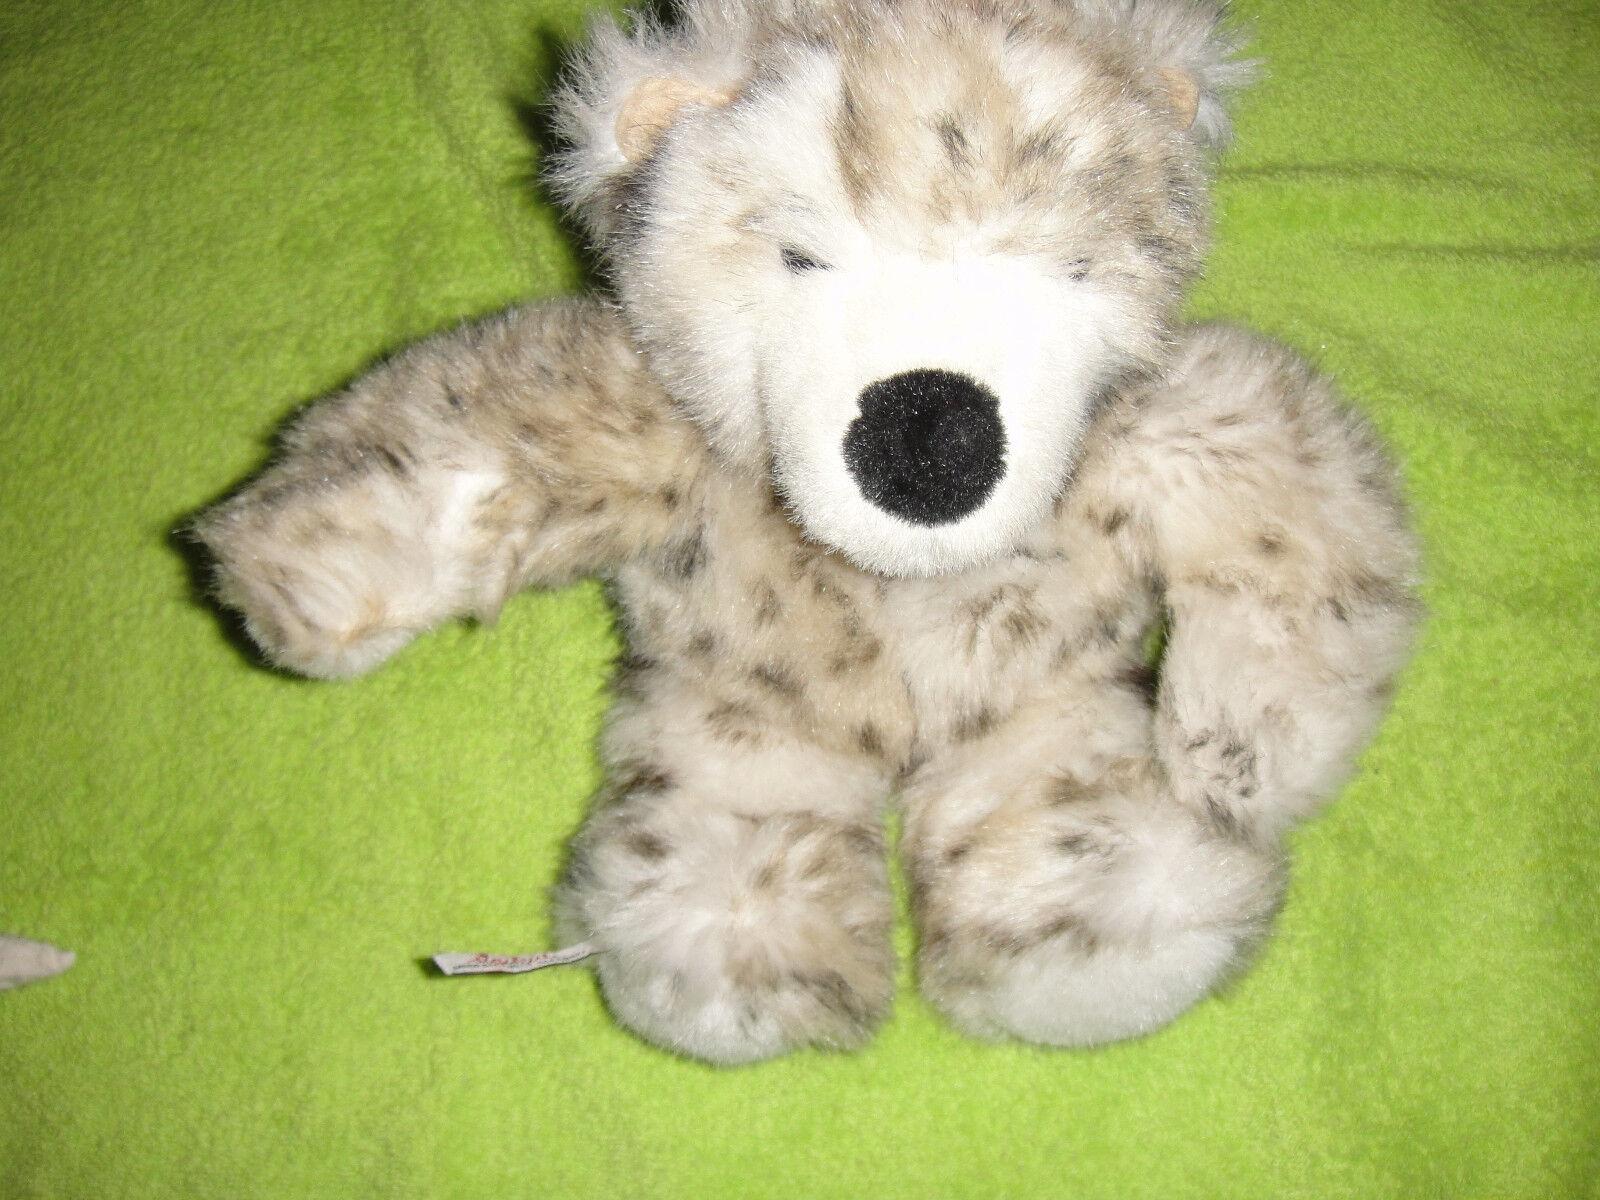 Schmusetier : Kuscheltier : BEASTS Eisbär Bär Sigikid Sigikid Sigikid Zottel Katze Tiger Hund 051a3b